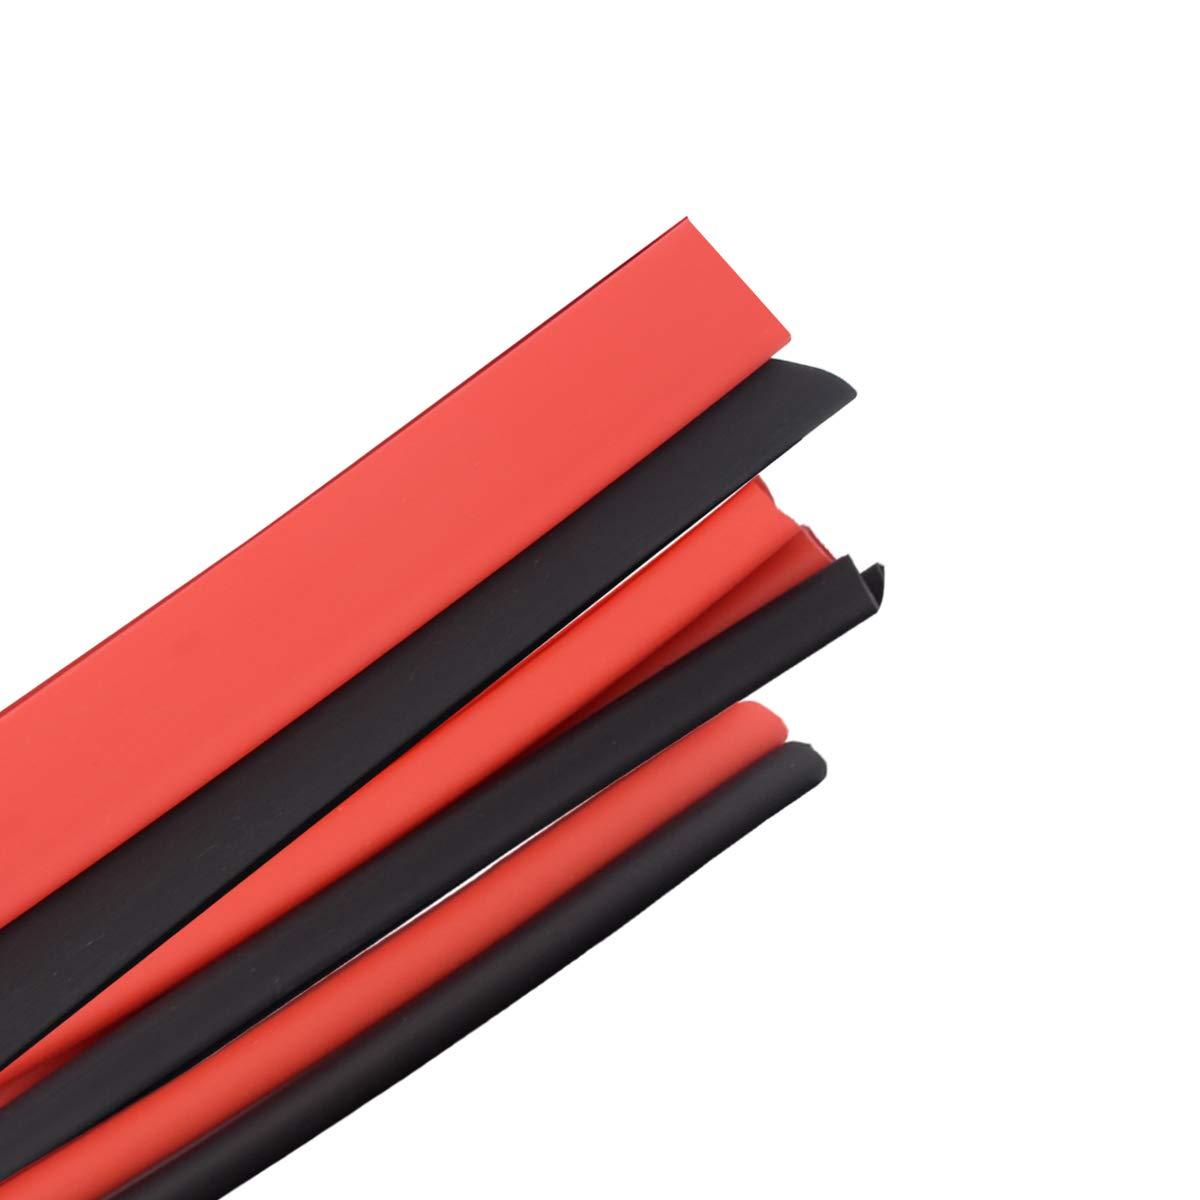 Funda Termoretractil,3 Metros(Negro 1.5M Rojo 1.5M),Varios Di/ámetros Tubo Termorretr/áctil Aislamiento Poliolefina 3 1 con Pegamento,Conectores Electricos,Cinta Aislante Protecci/ón el Cable